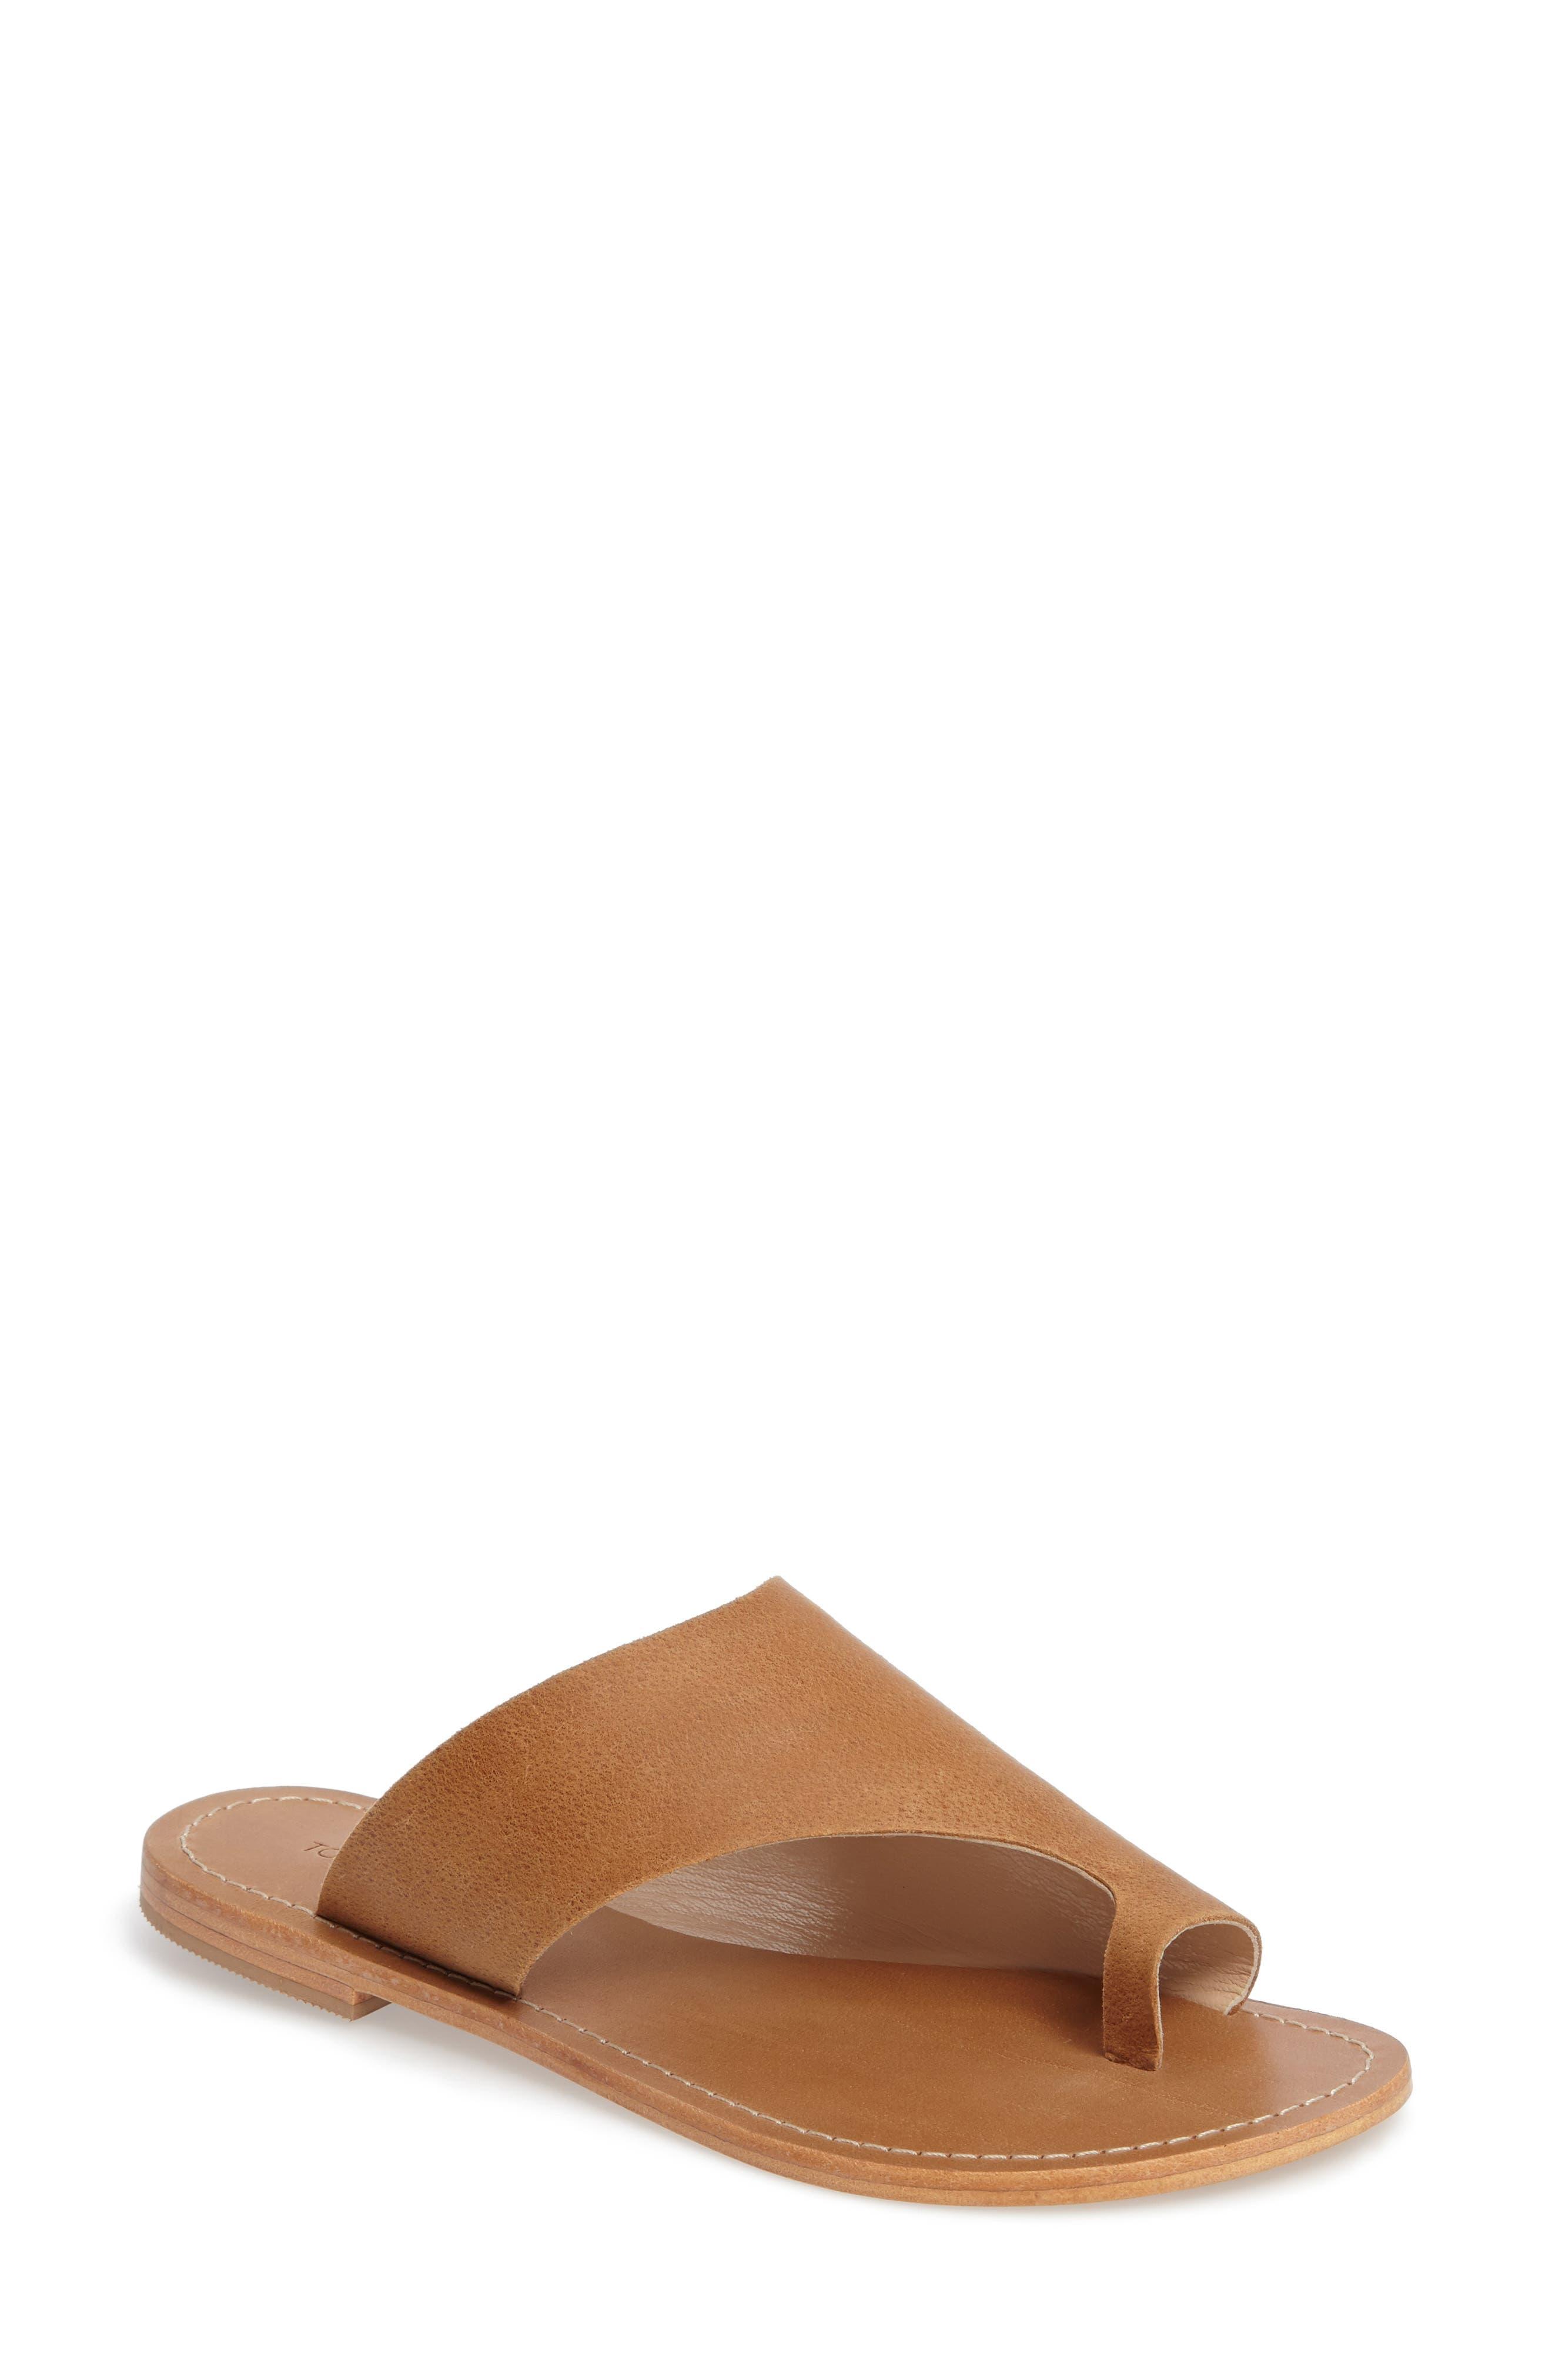 Fleet Slide Sandal,                         Main,                         color, Tan Leather